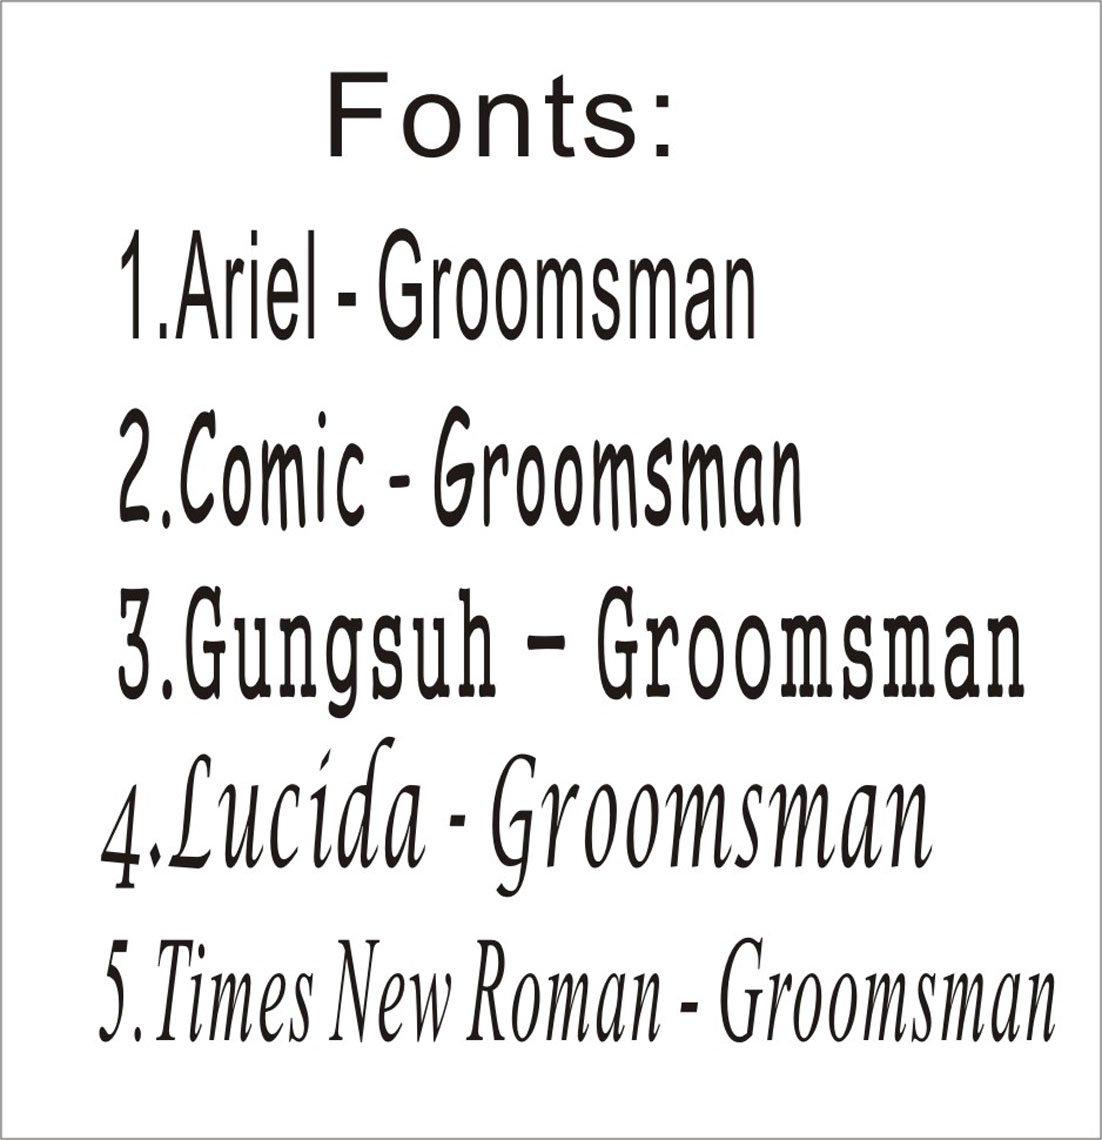 Set of 2 Bulk discount- Personalized Hatchet Axes Groomsman, Groomsmen Gift-Engraved Throwing Axe for Men-free engraving by e-tradeusa (Image #4)